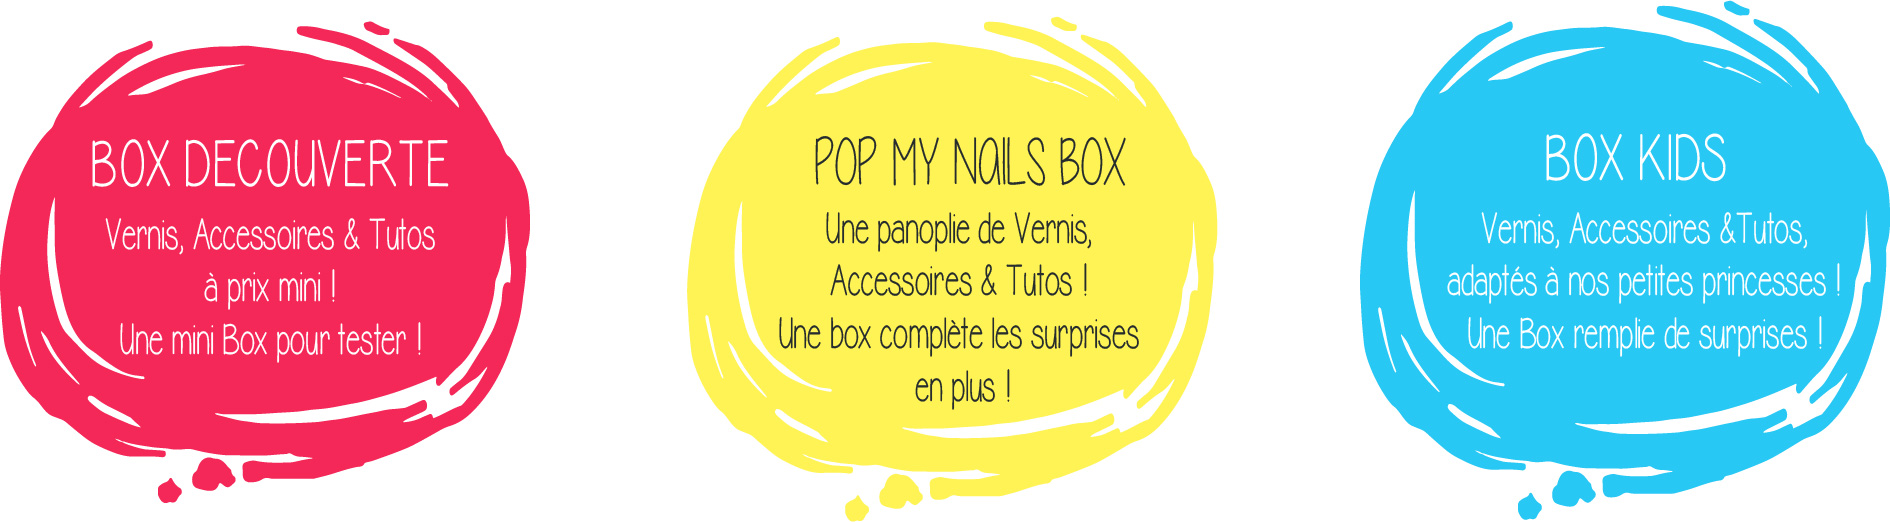 3 Box vernis Pop My Nails